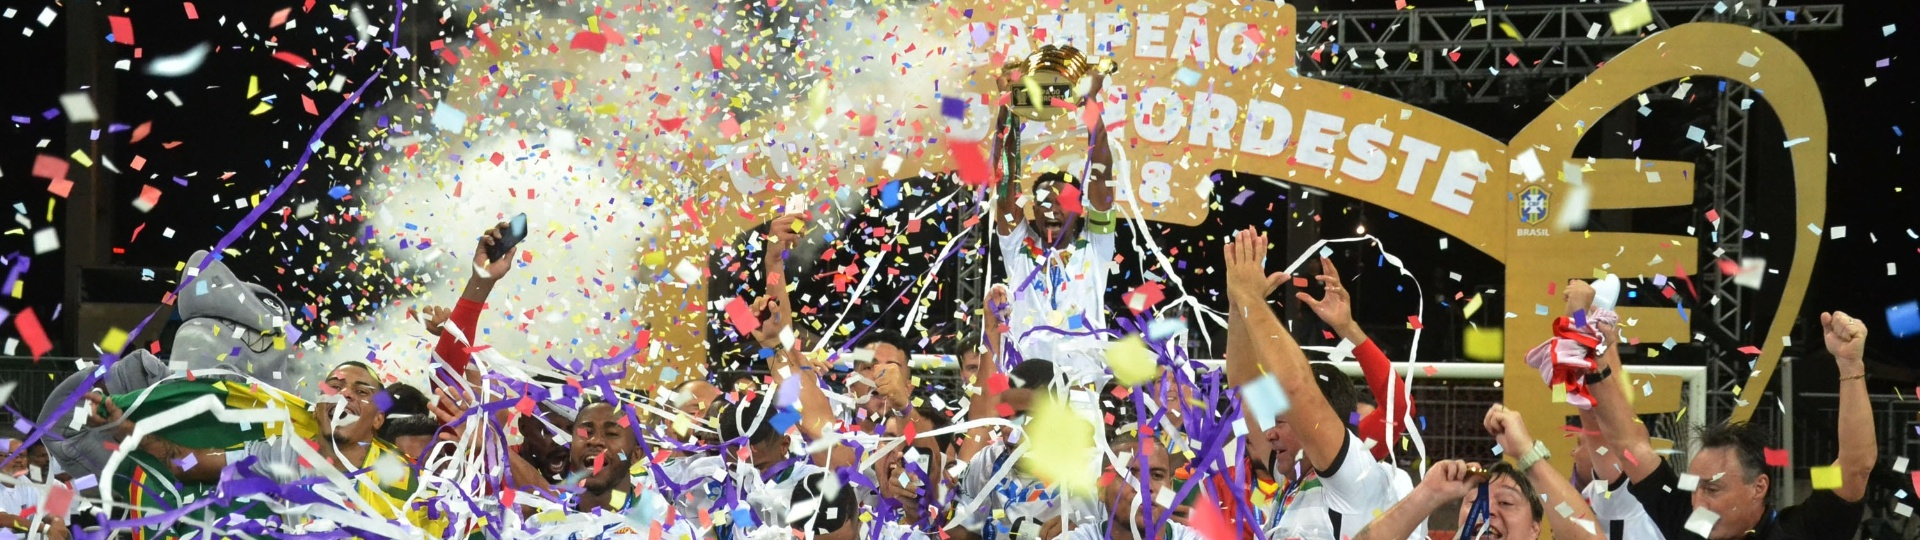 Jogadores do Sampaio Corrêa comemoram título da Copa do Nordeste conquistado sobre o Bahia